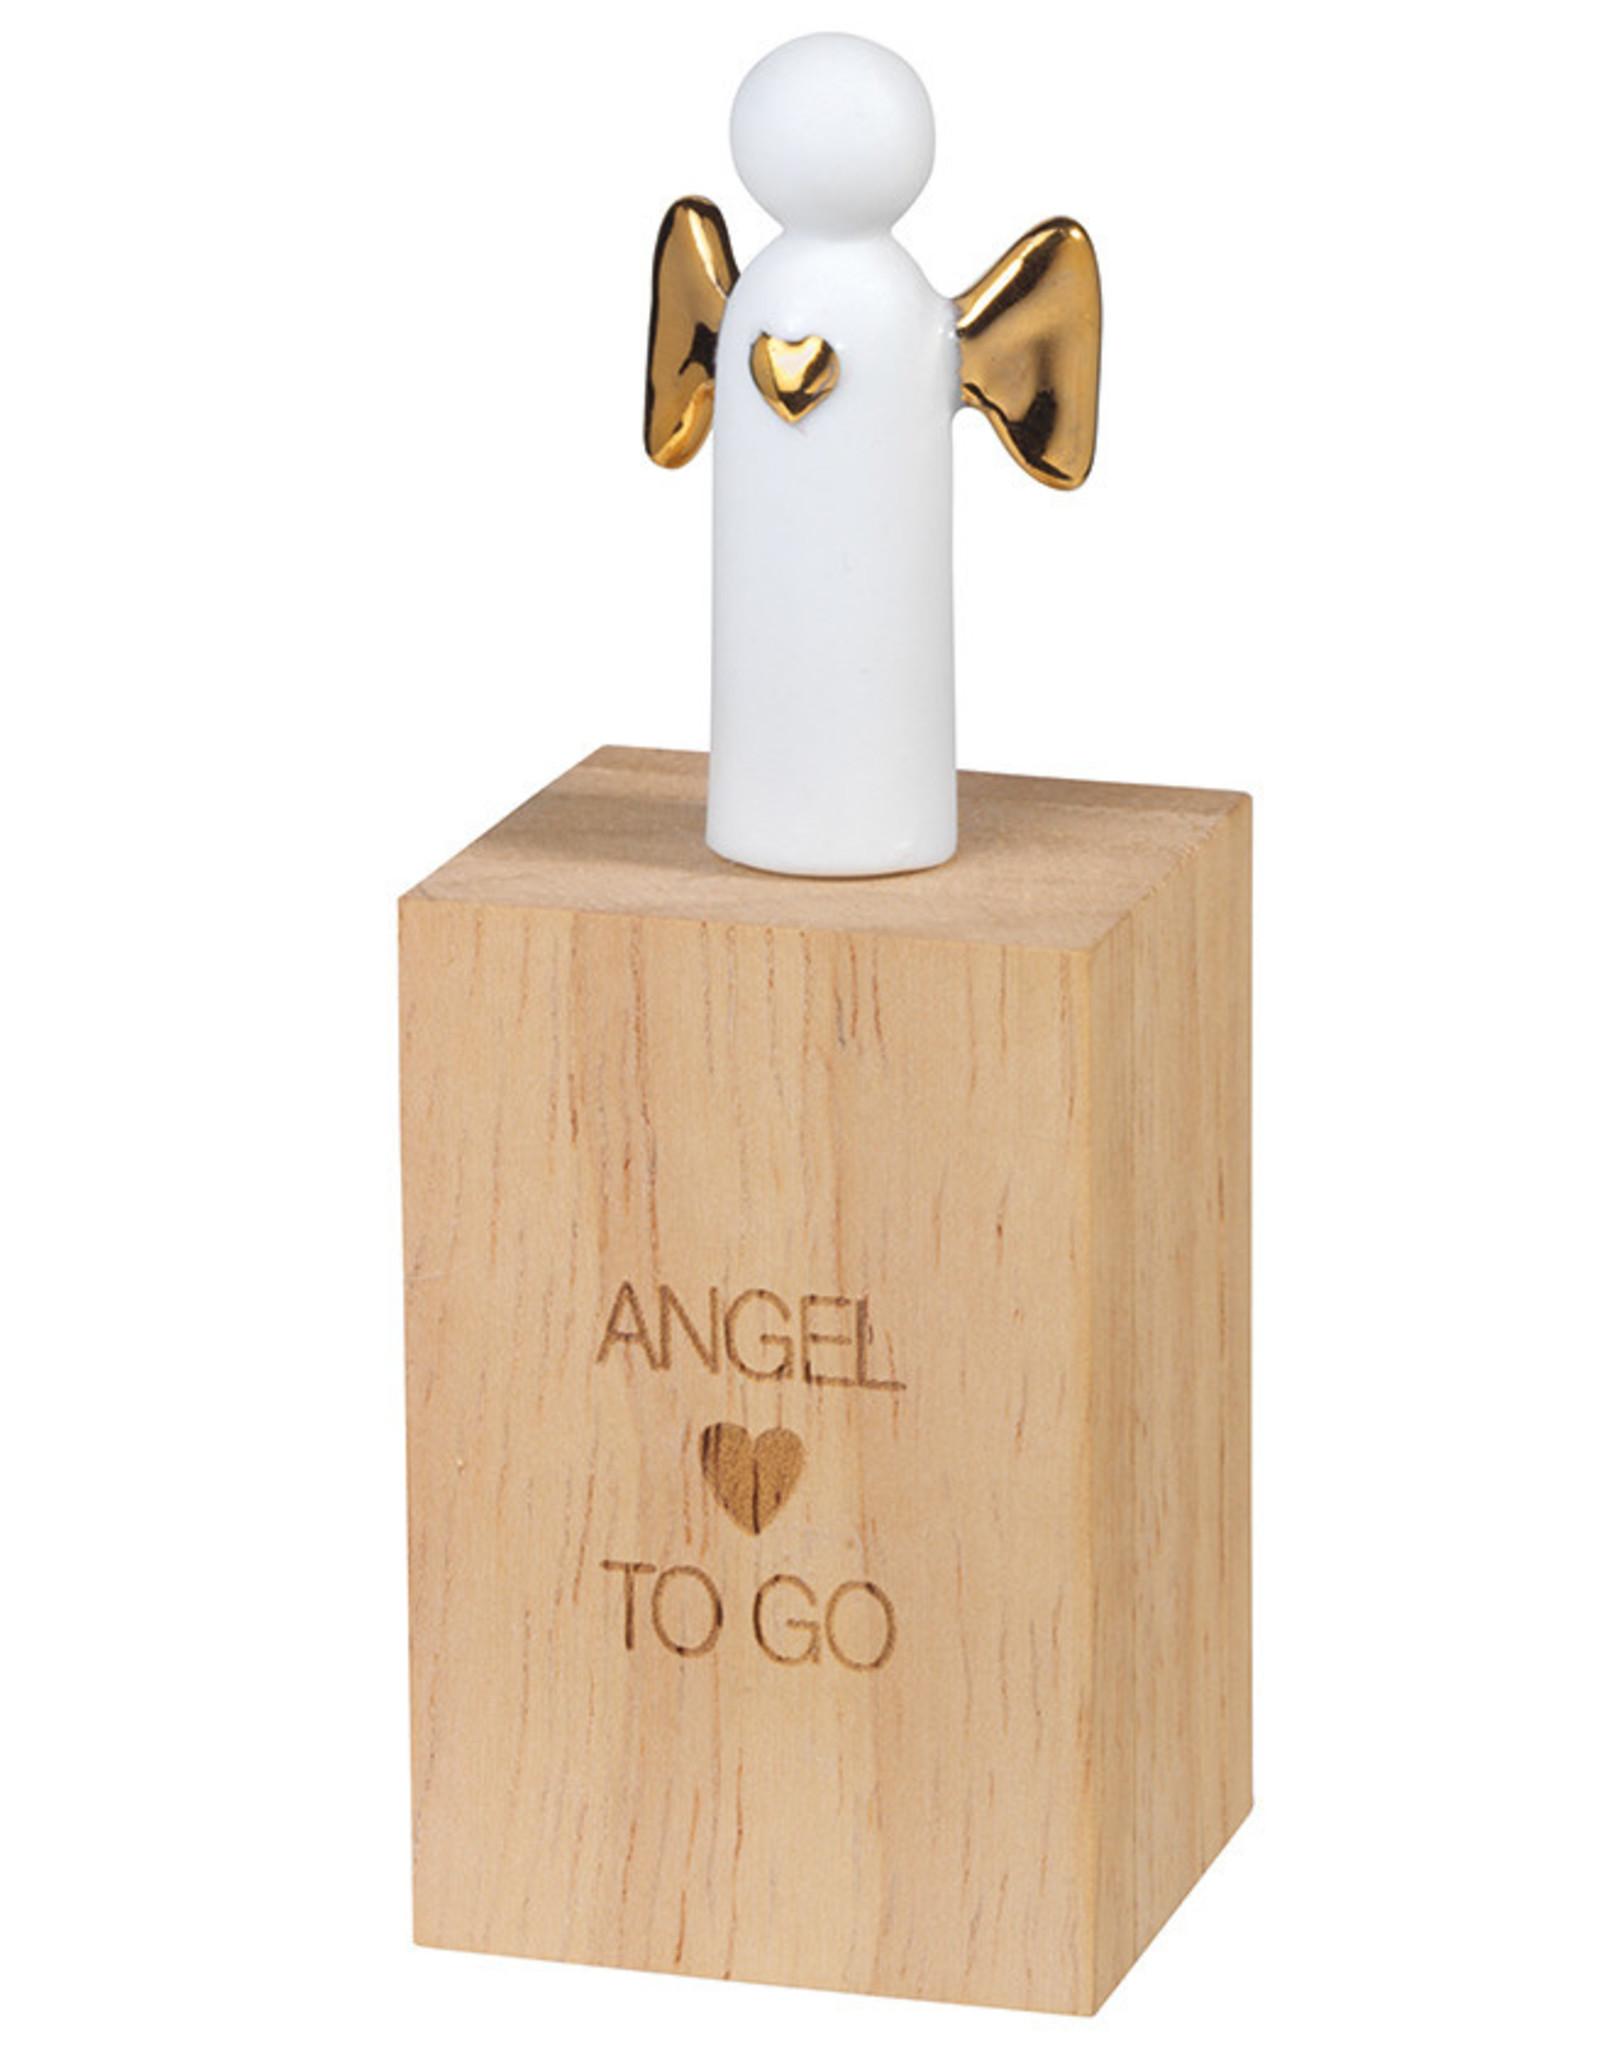 Raeder Angel to go